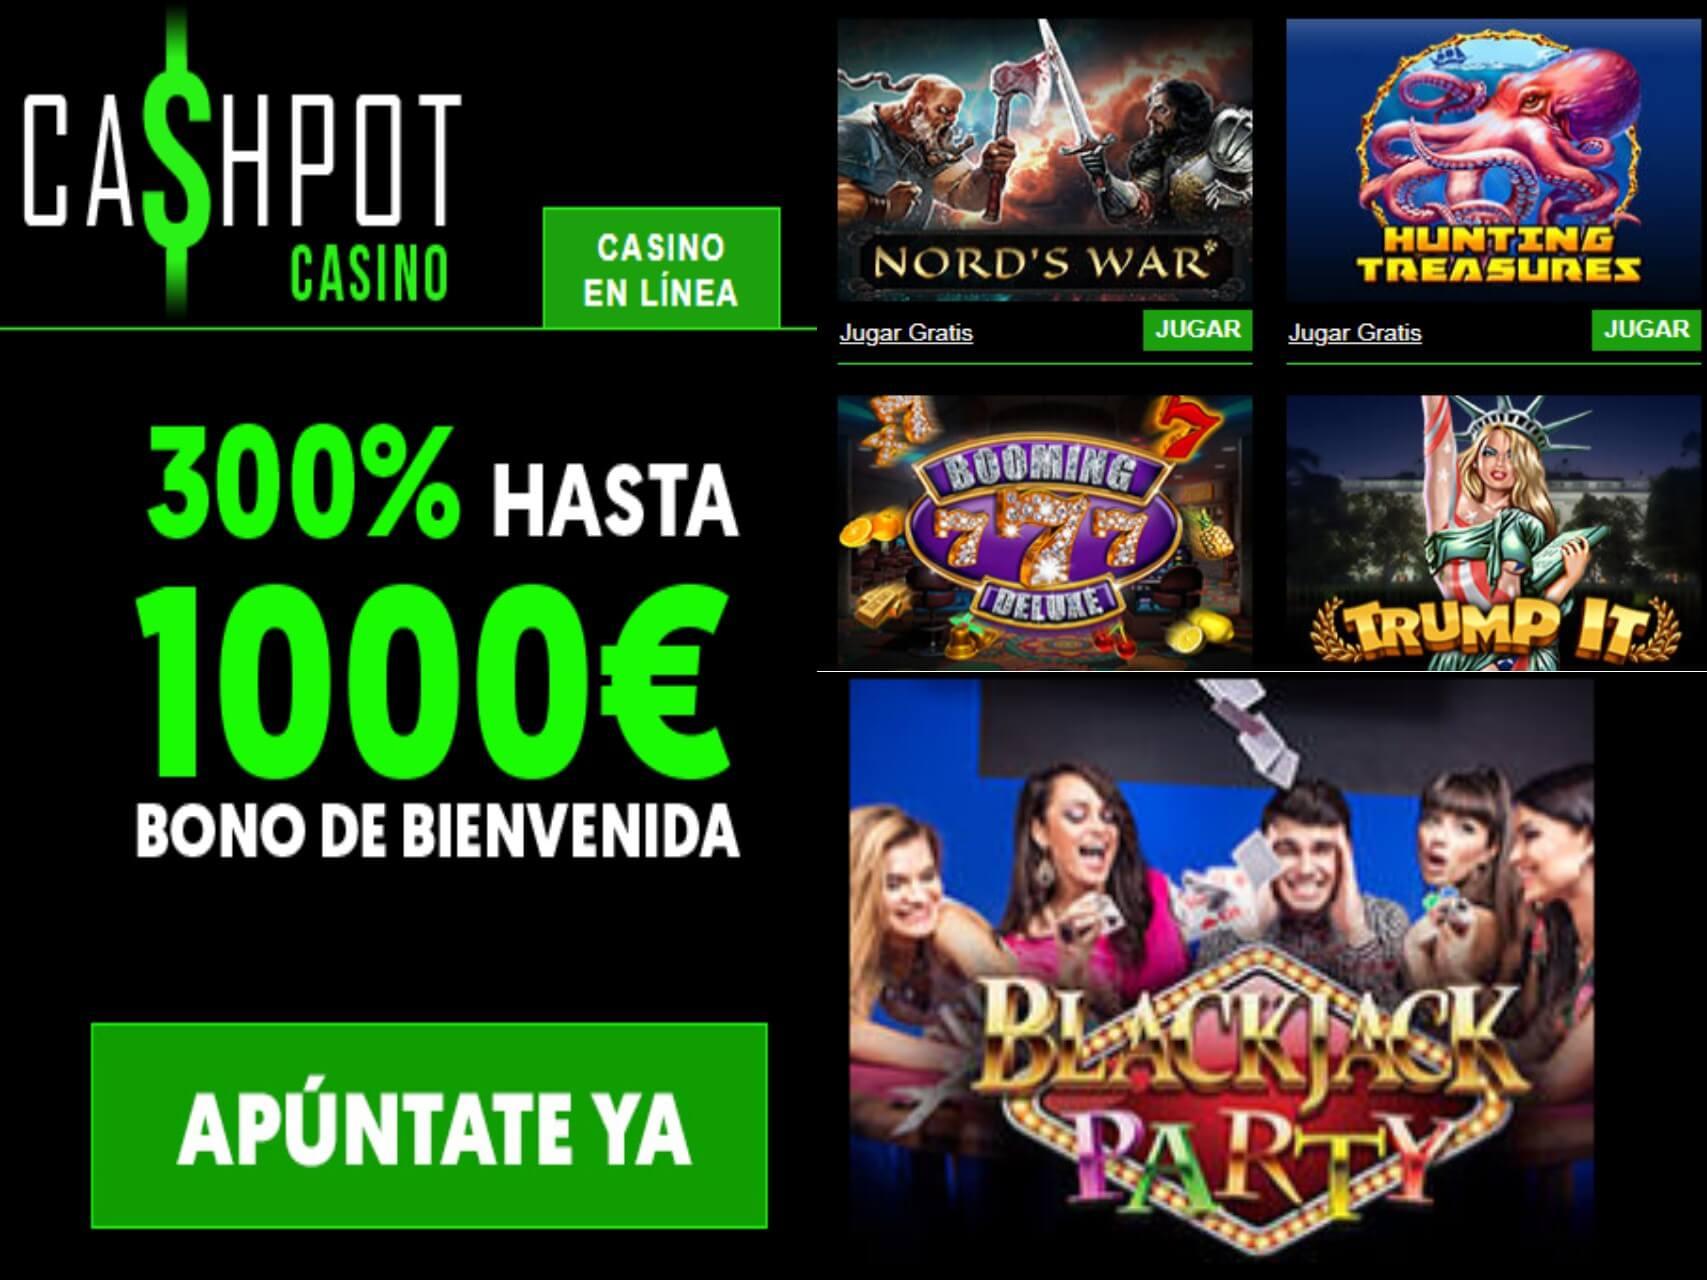 Casino Cashpot otorga 300% por bono de bienvenida